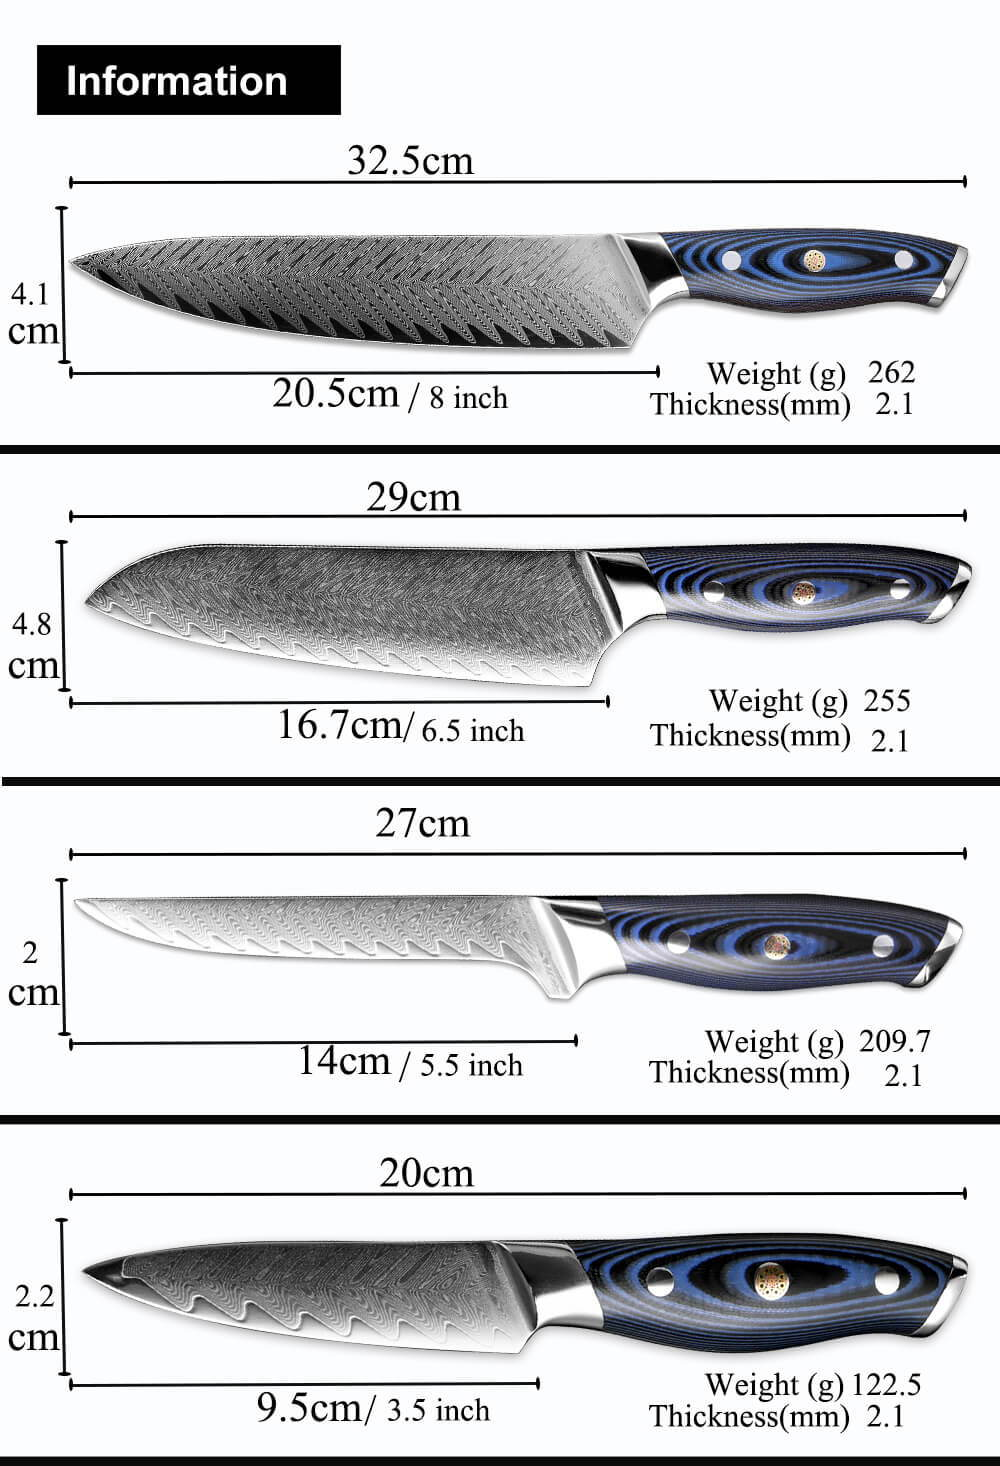 Seido Kitchen Knife Set Dimensions